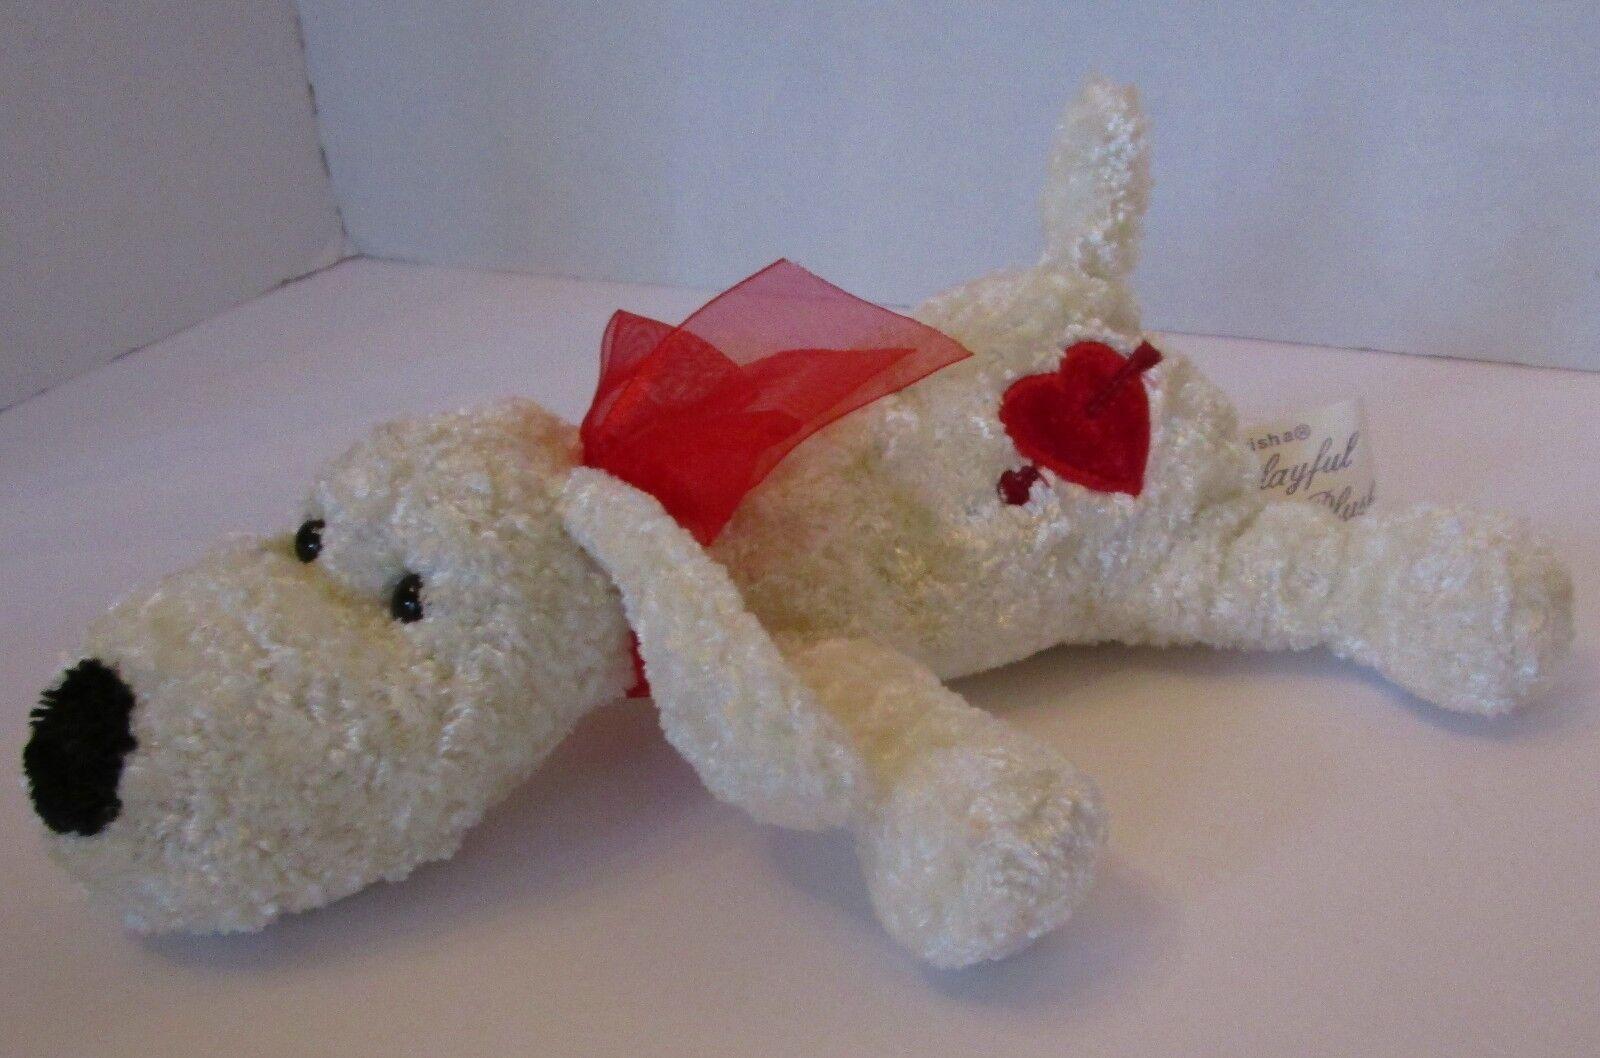 1988 Chrisha Playful Plush White Dog Floppy Beanbag Plush Valentine Heart 8